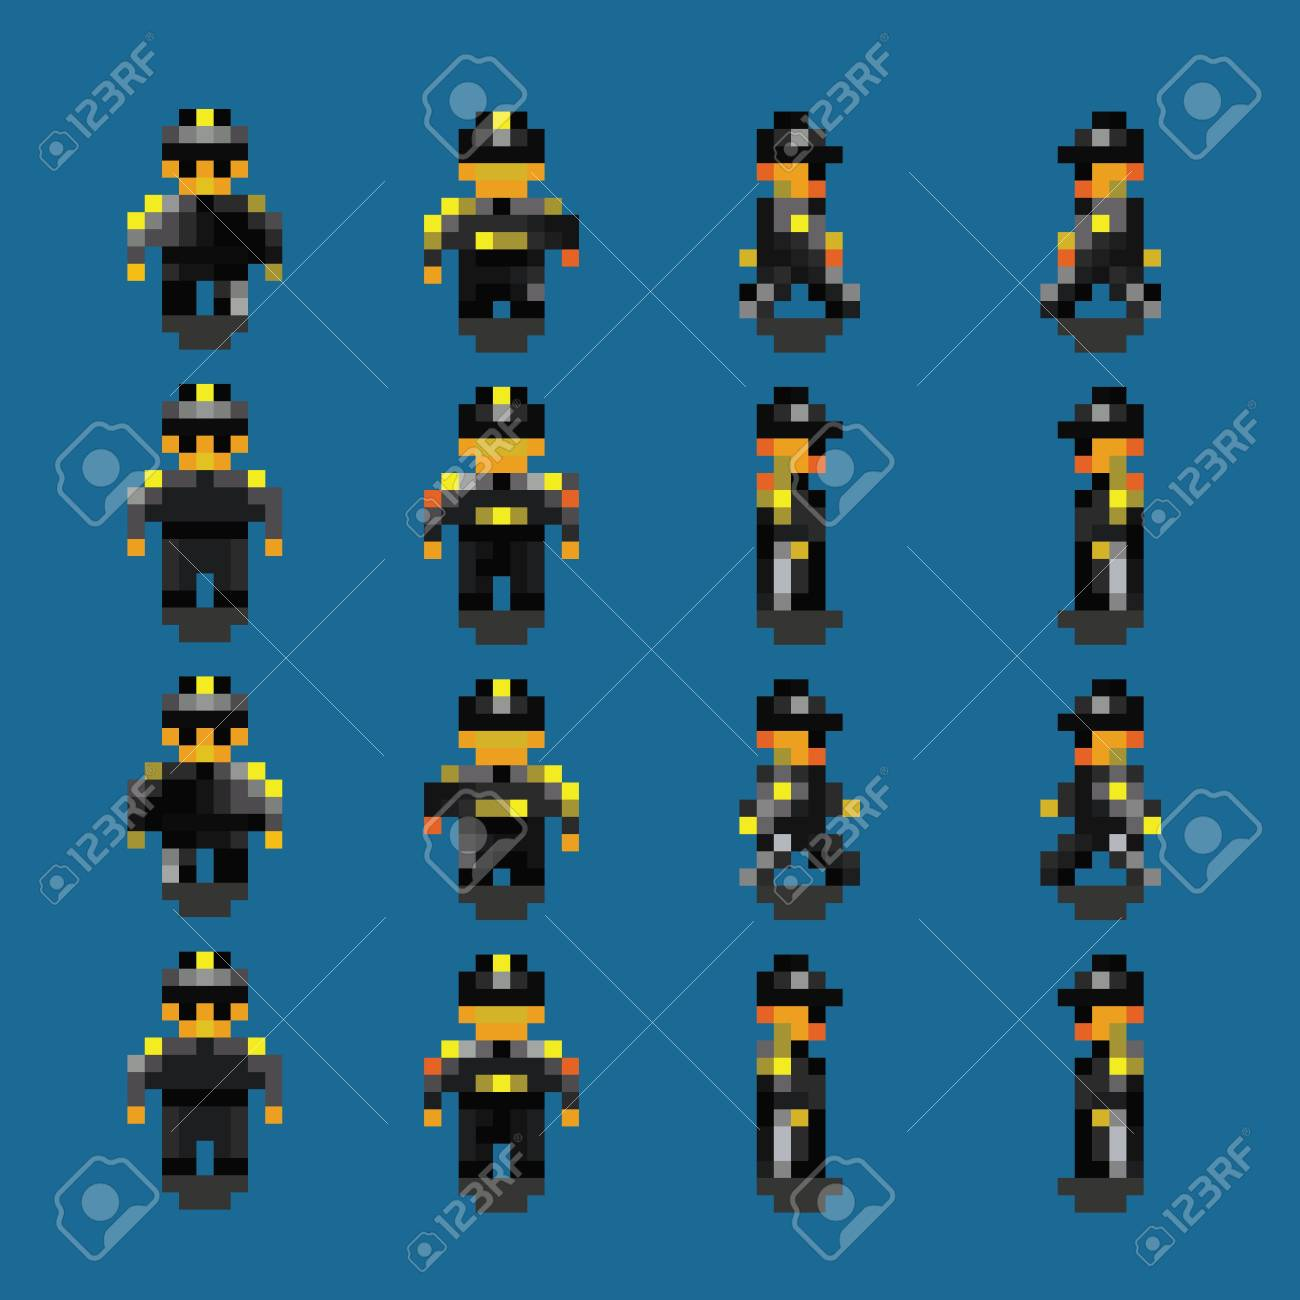 93835026-bodyguard-pixel-art-walk-animation-frames-vector-illustration Pixel Art Walking Animation @koolgadgetz.com.info